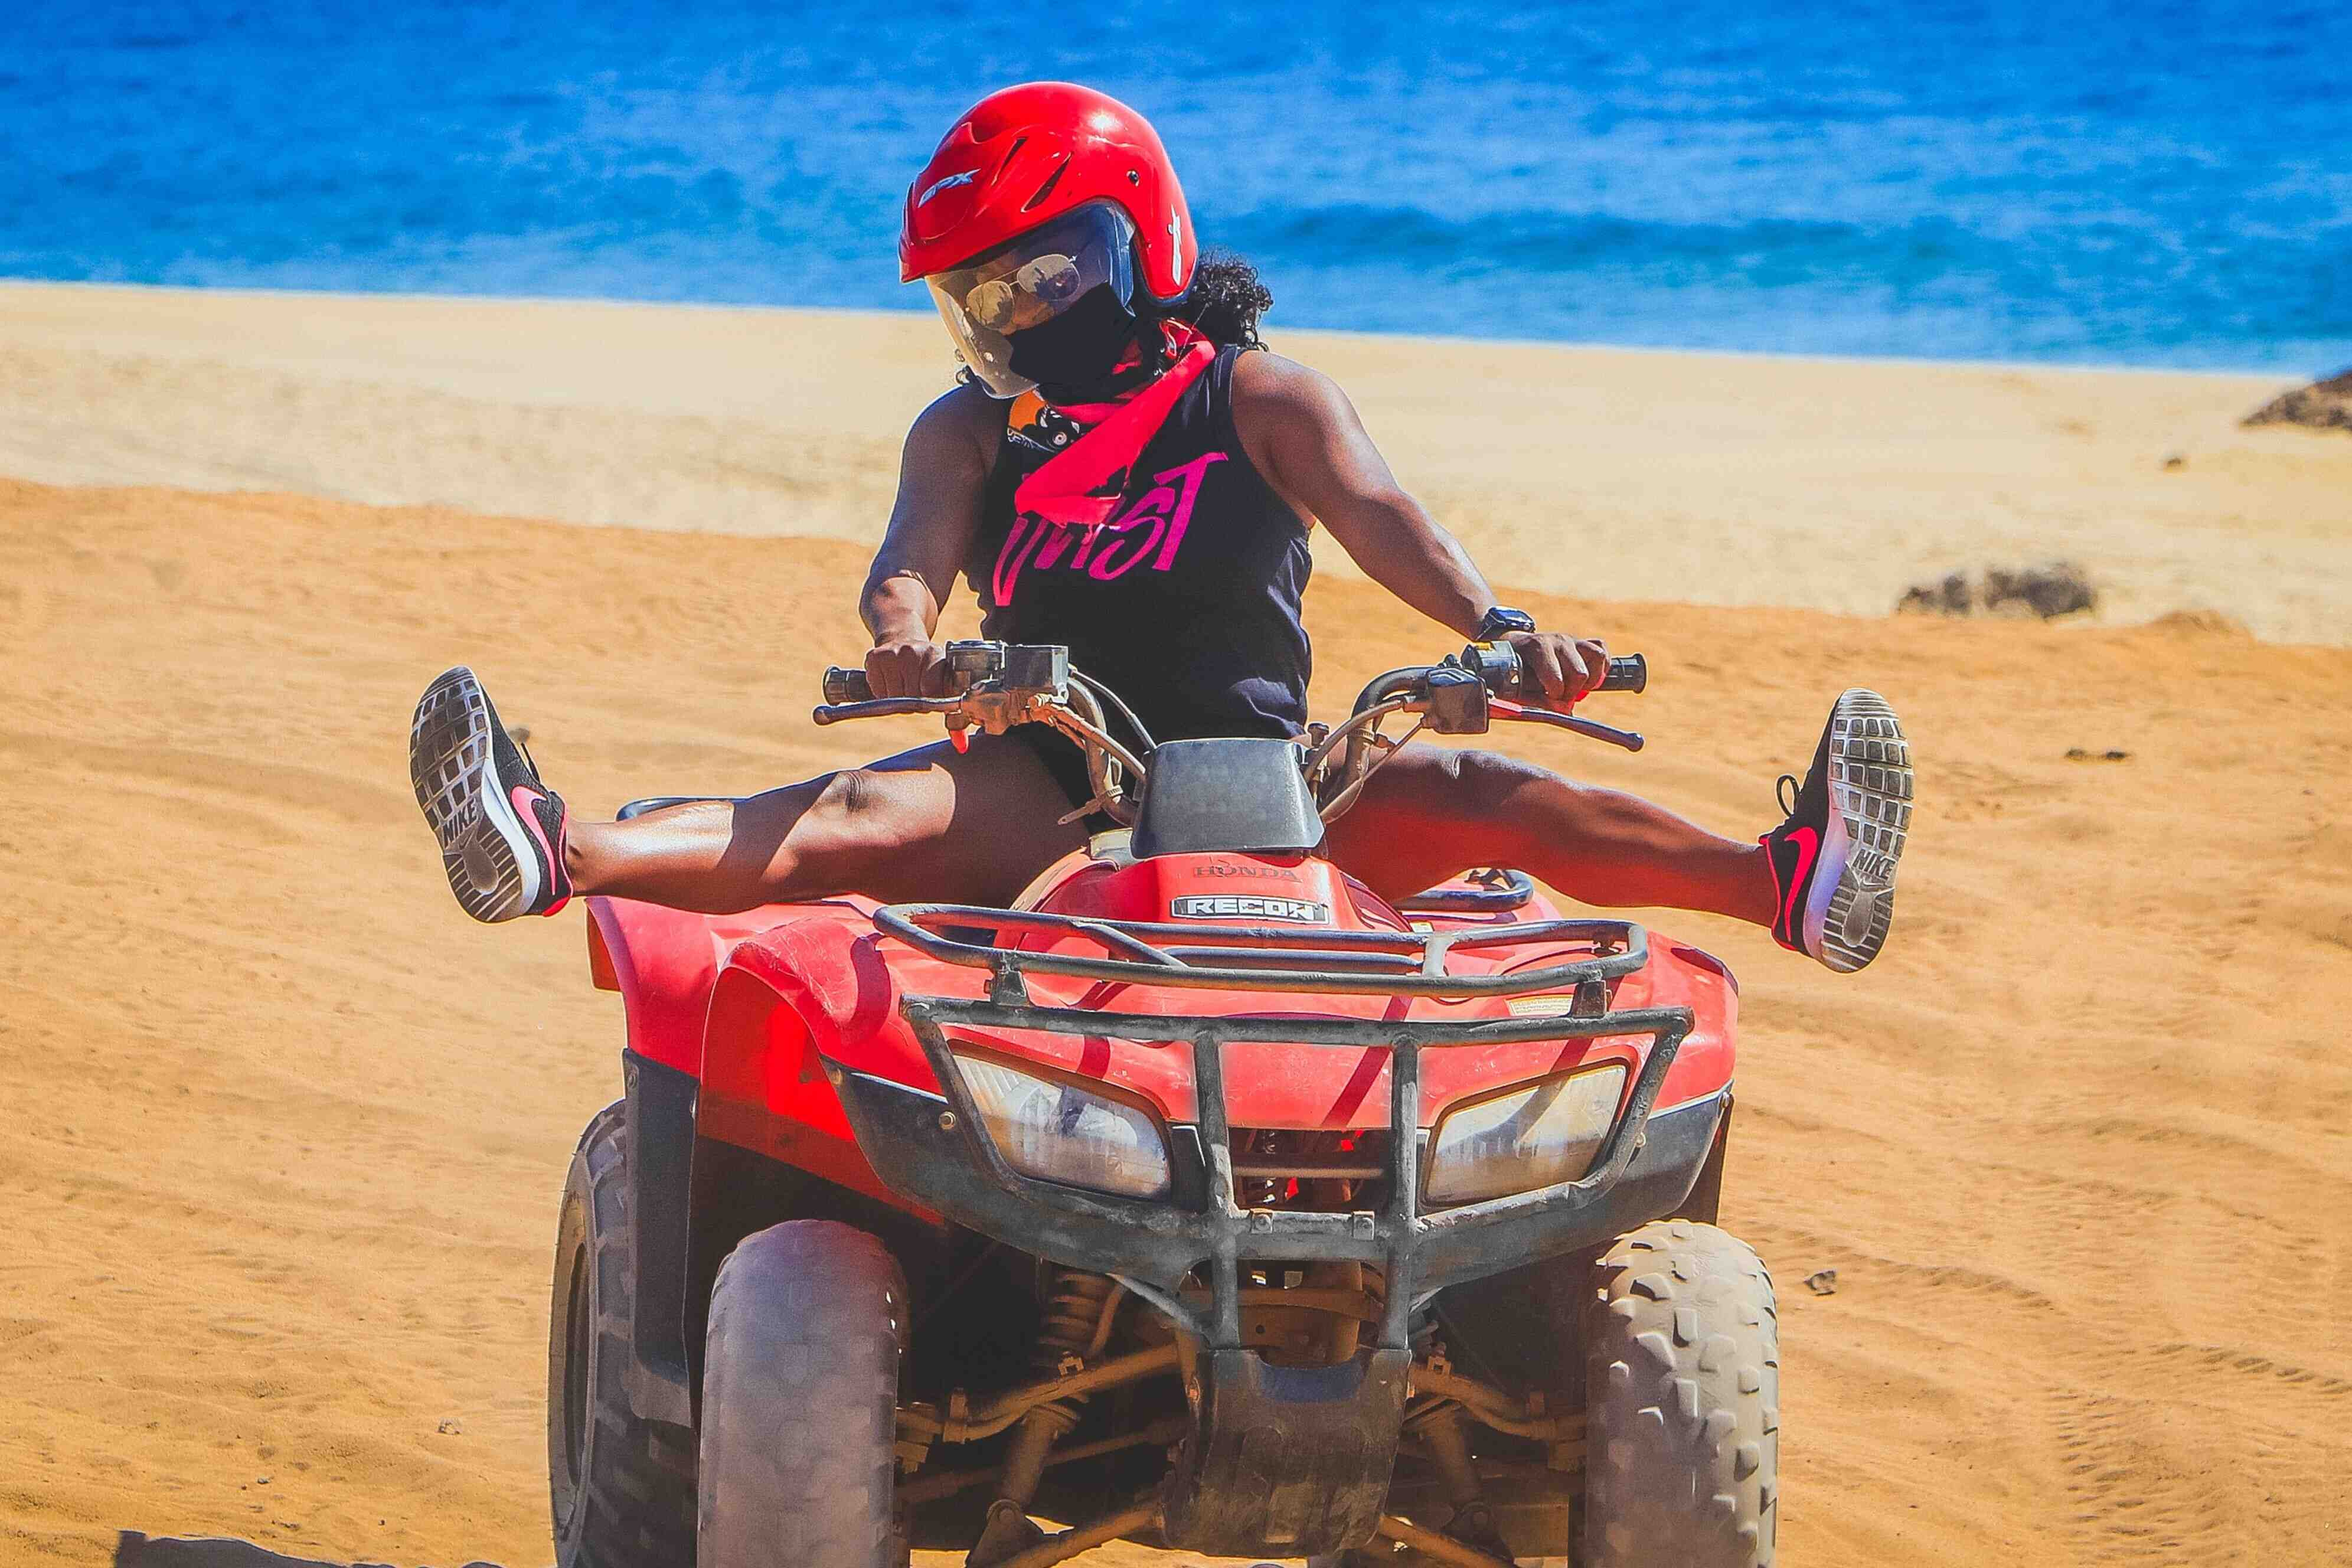 Migriño Single Atv Tour - Last Minute Tours in Los Cabos